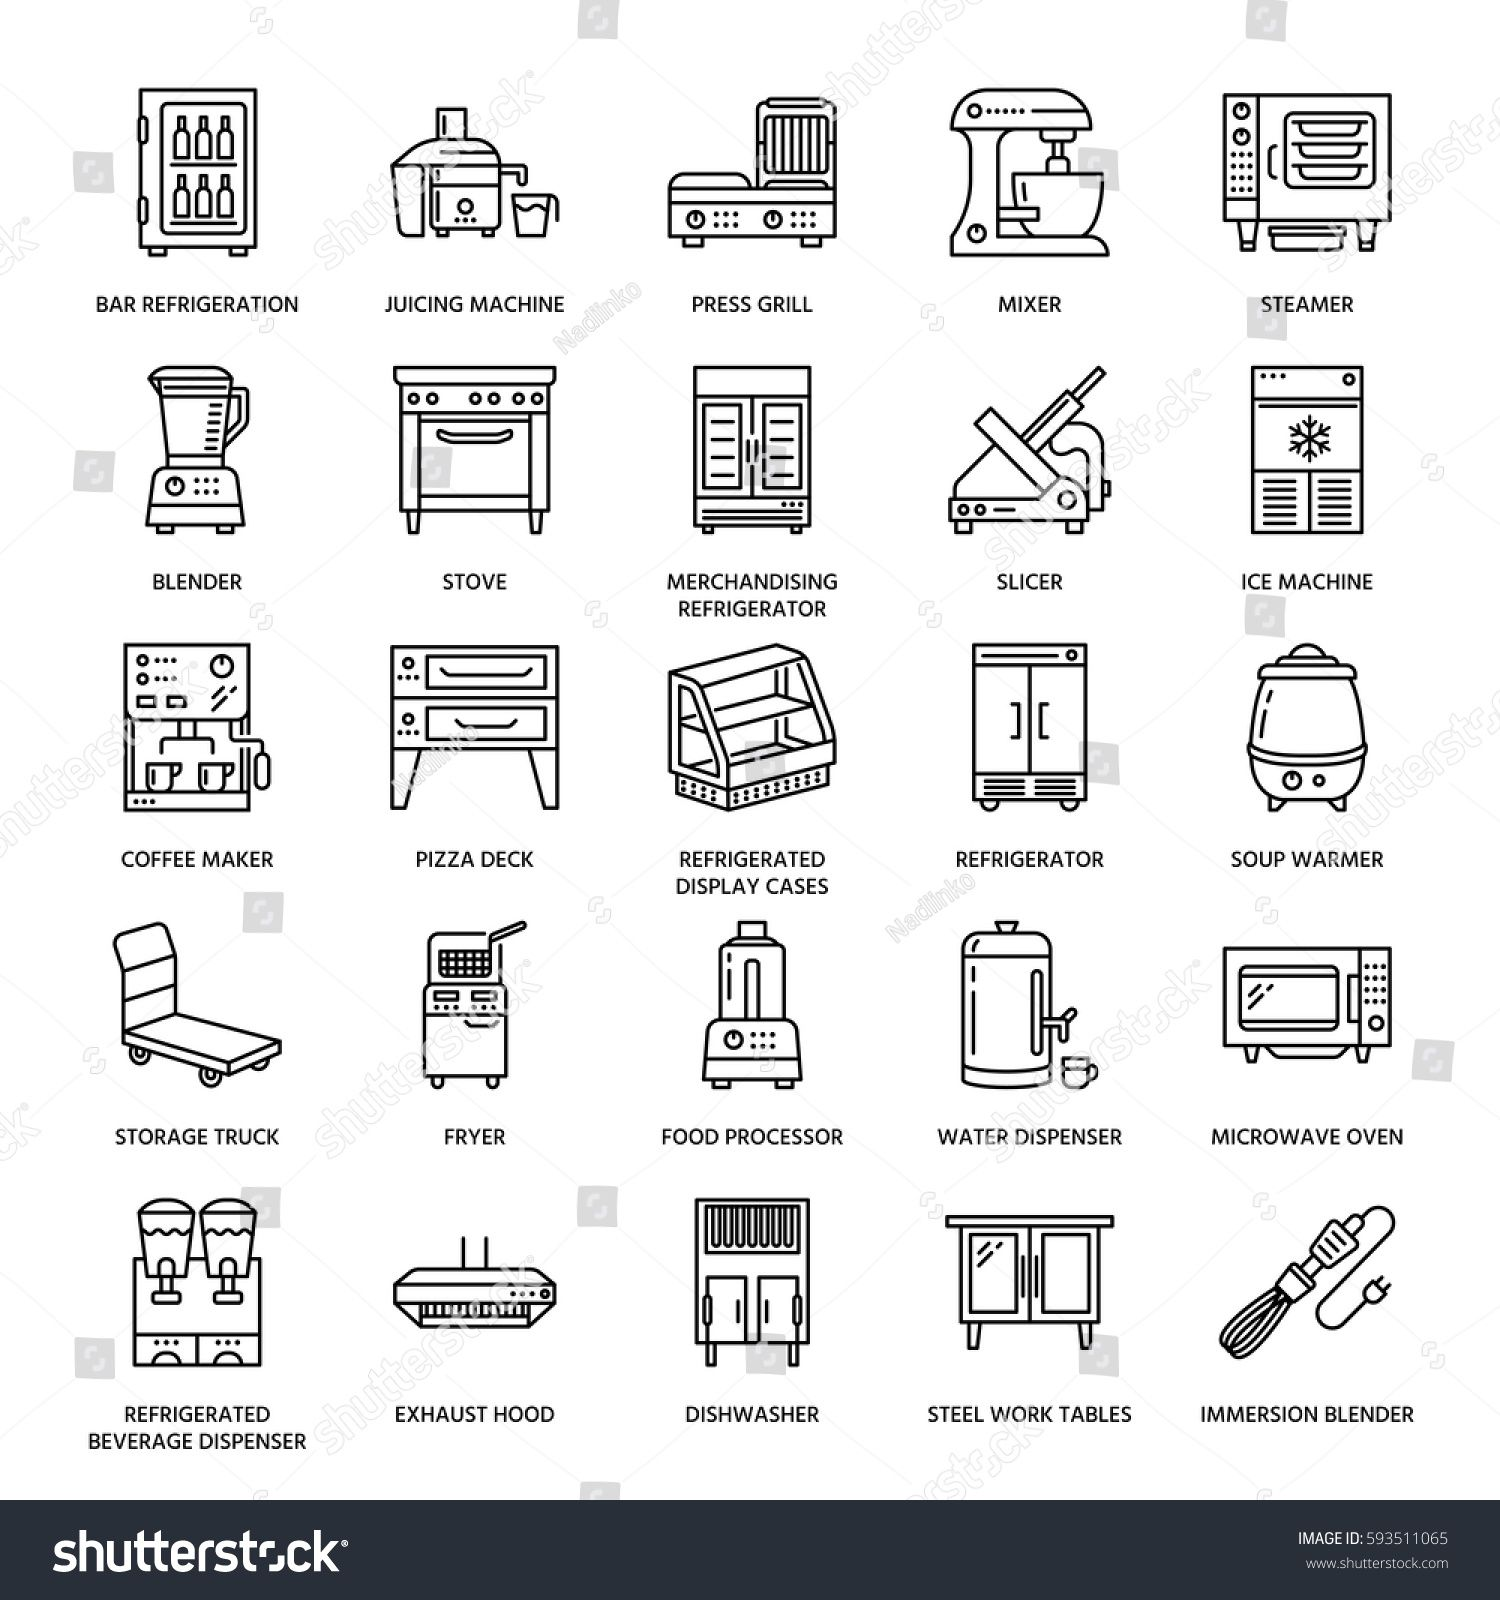 Restaurant Professional Equipment Line Icons Kitchen Tools Mixer